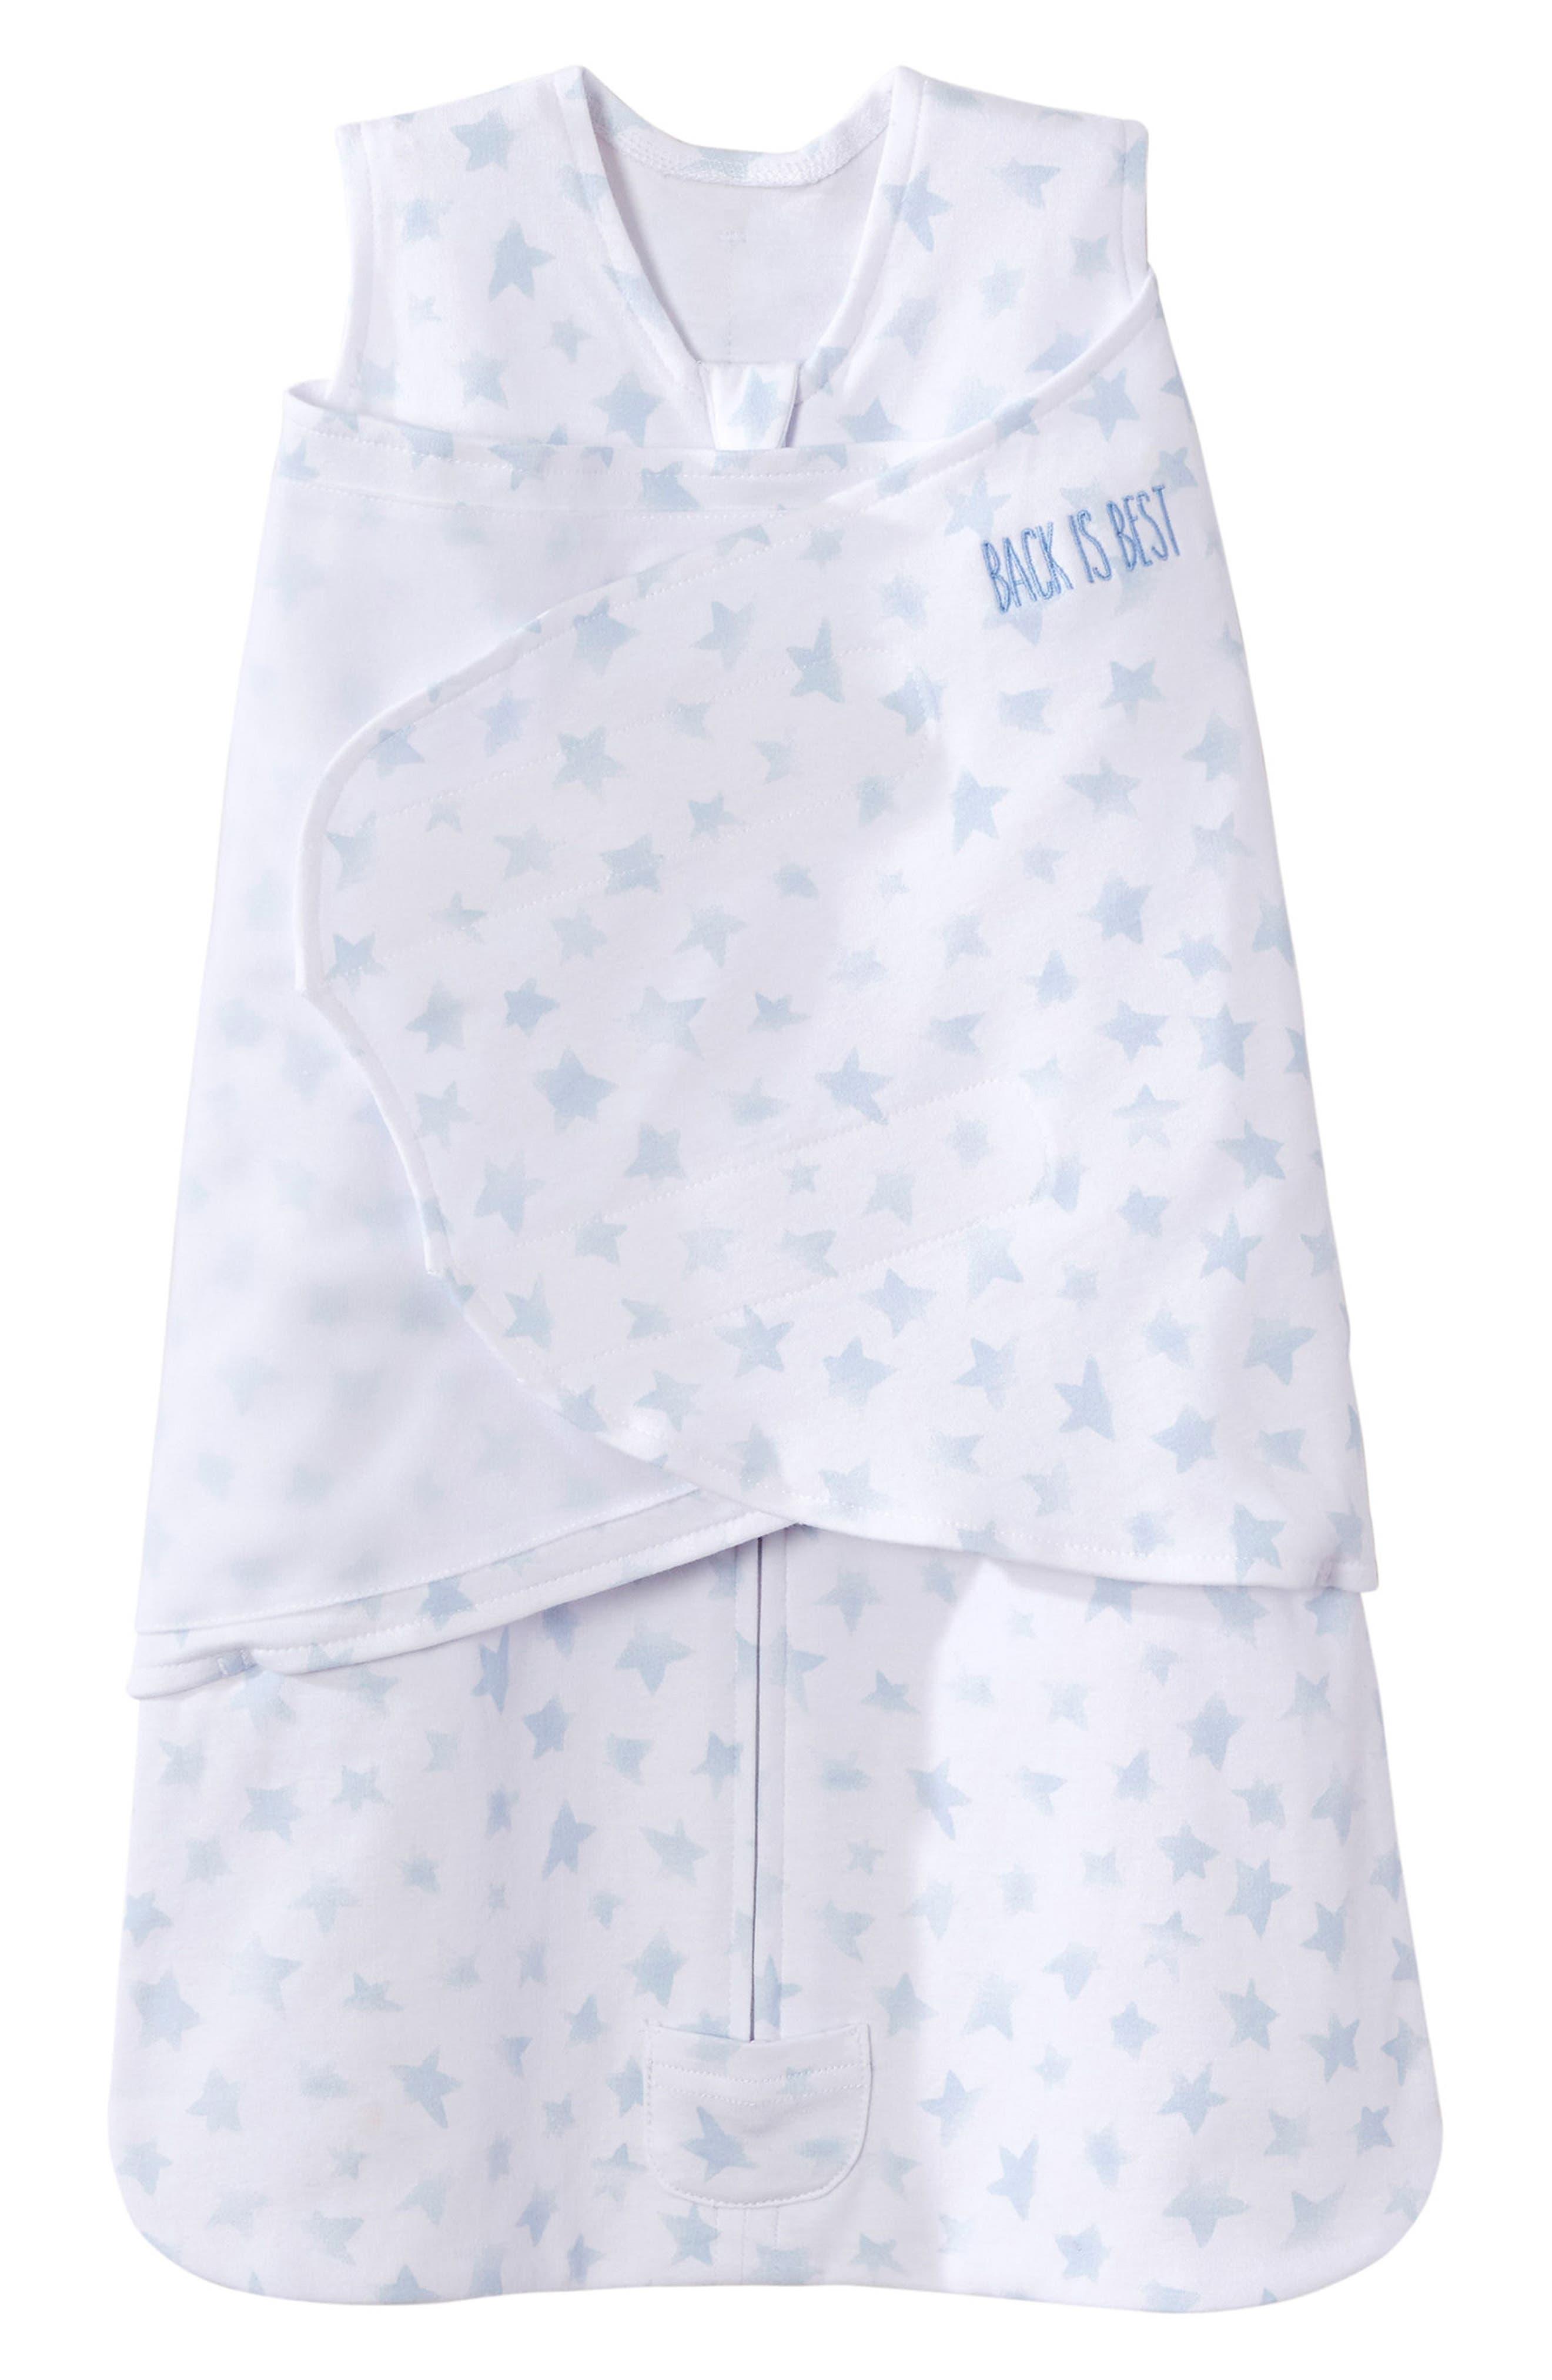 Platinum Series SleepSack<sup>™</sup> Swaddle,                         Main,                         color, Pale Blue Twinkle